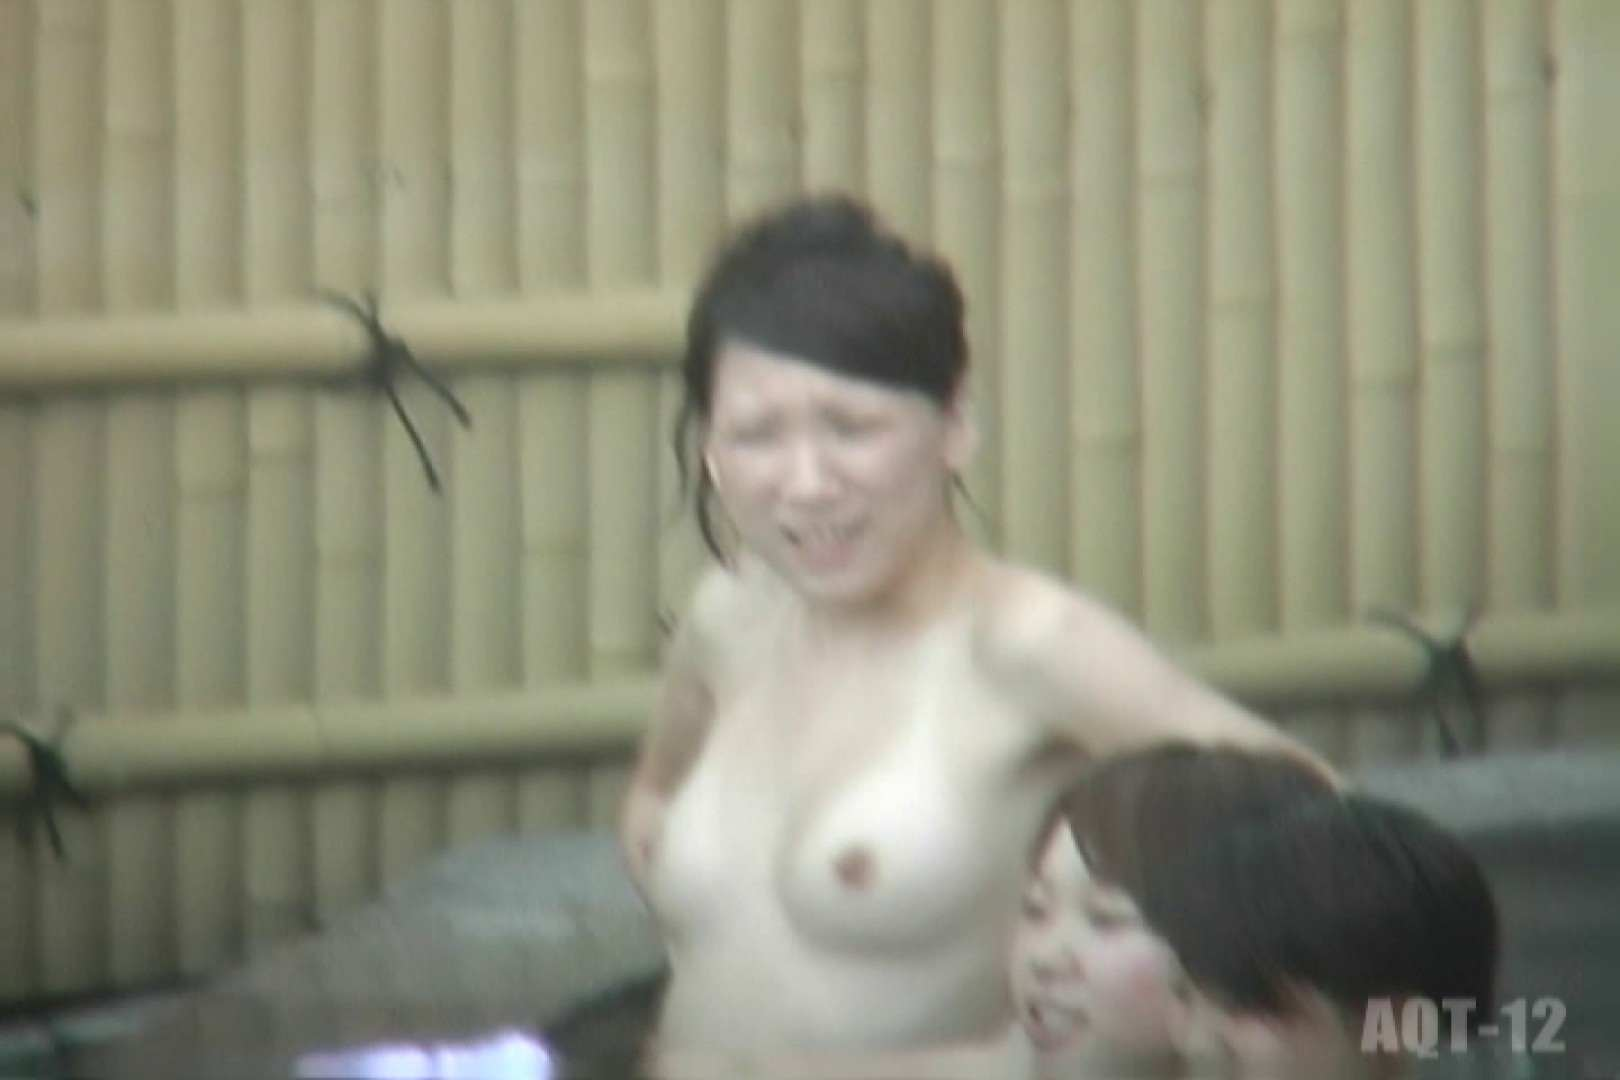 Aquaな露天風呂Vol.805 OL女体  53連発 3